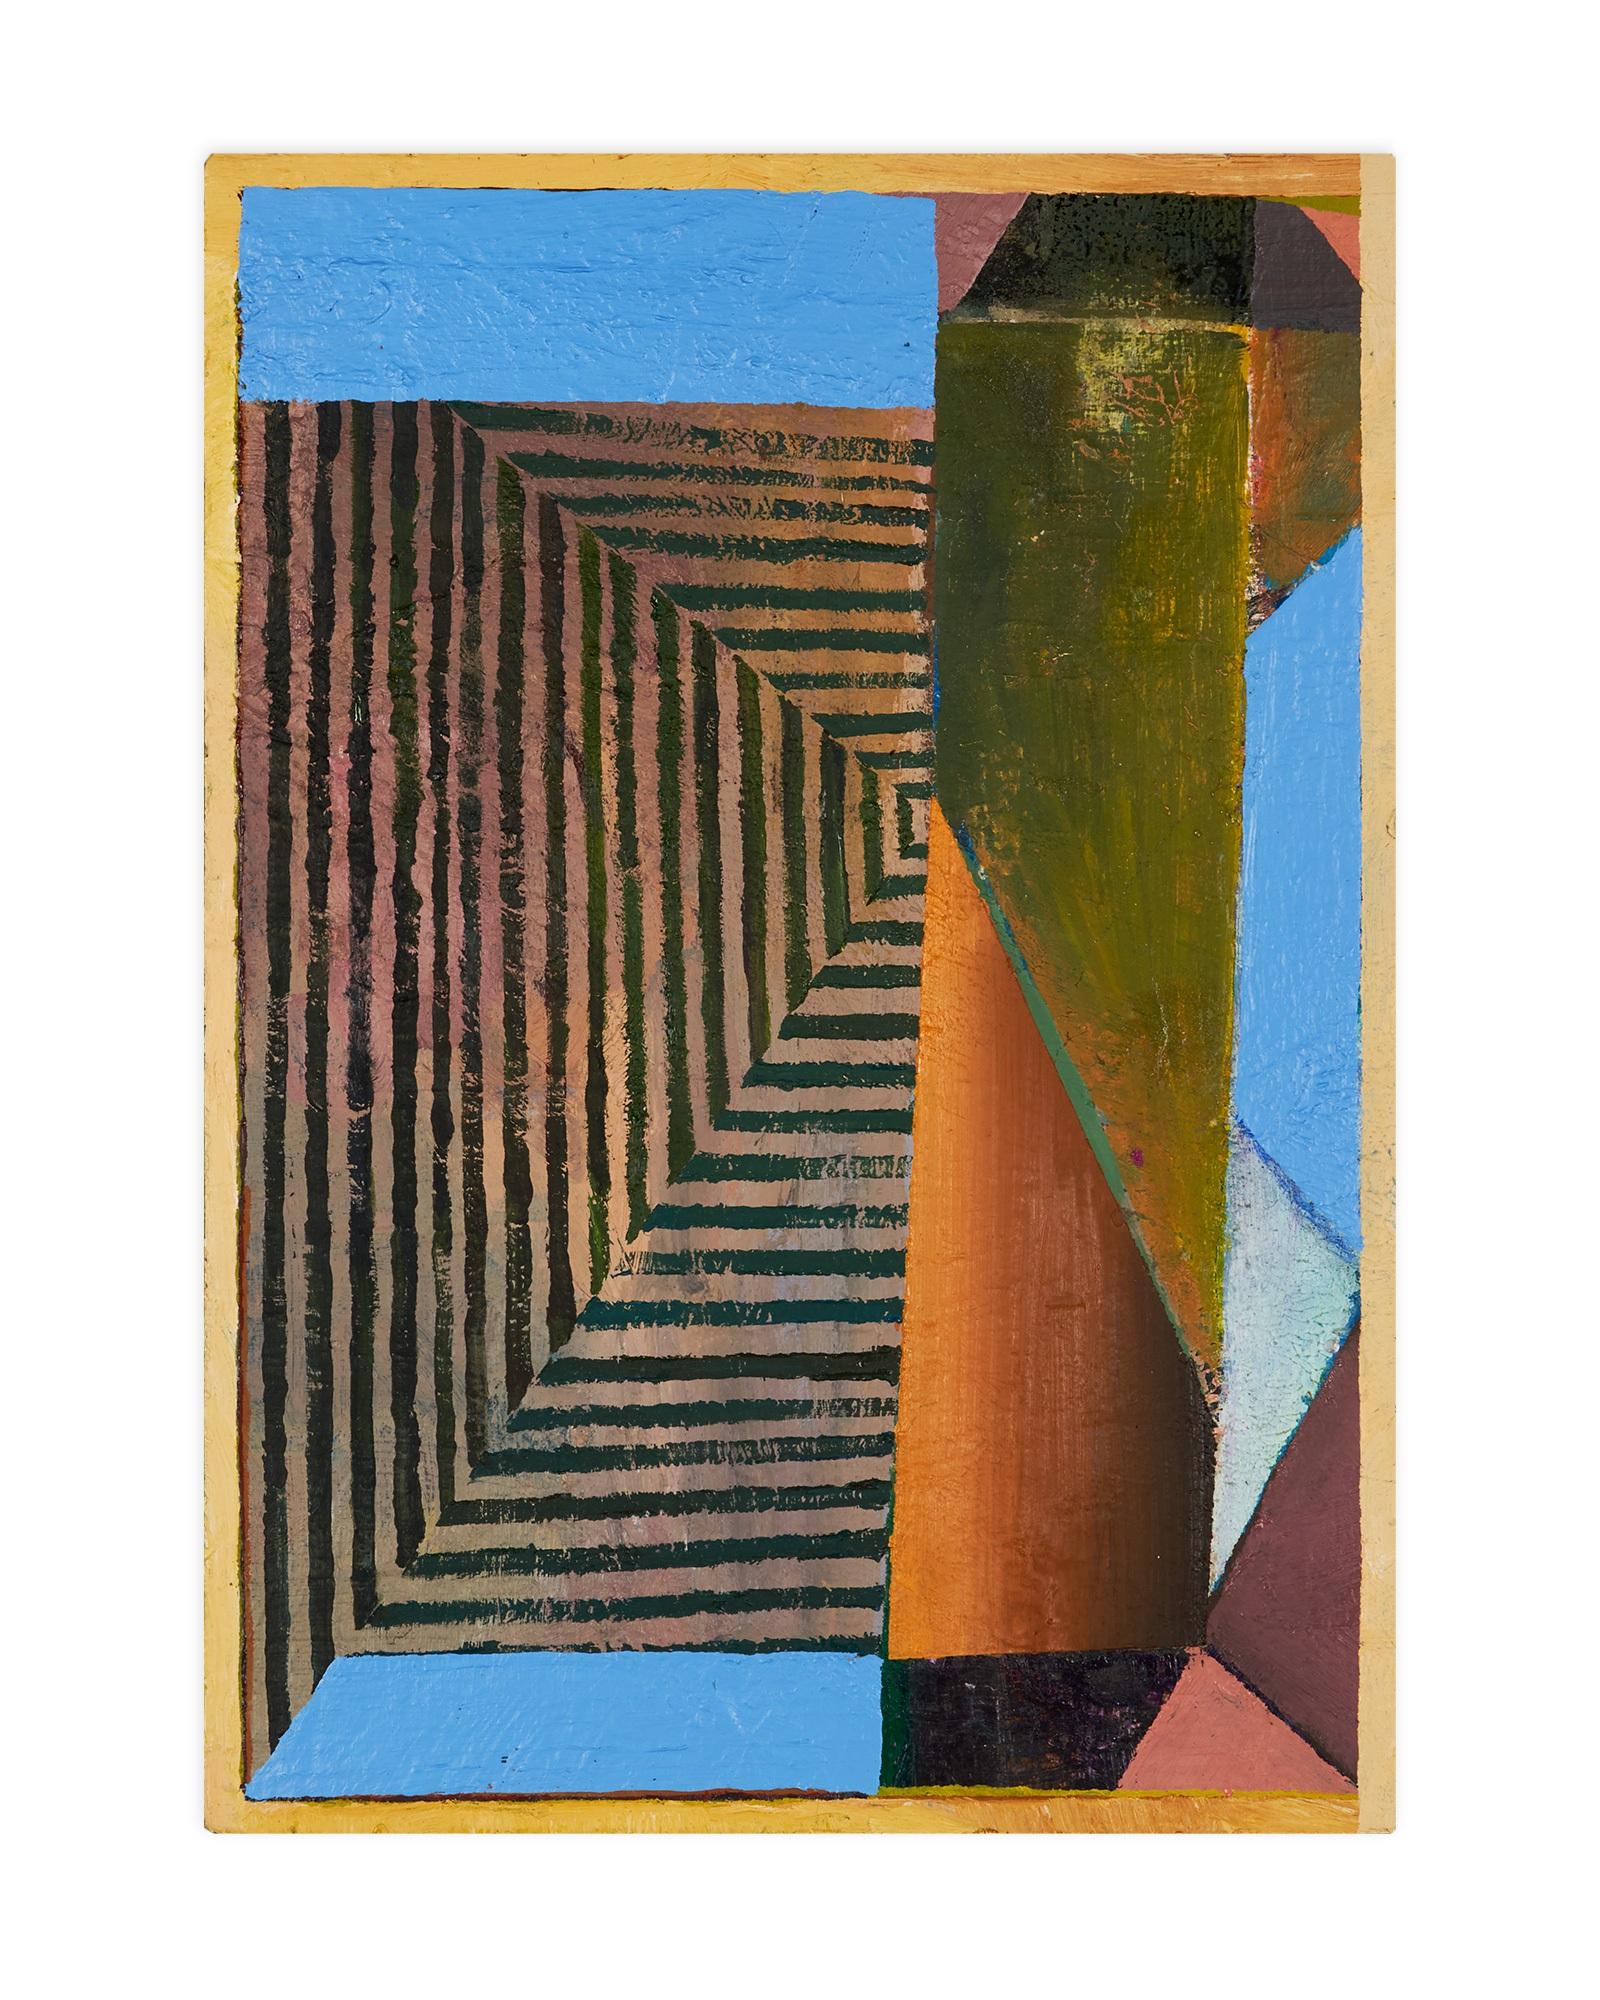 20190502_Santiago-Escobedo-Garcia_Paintings_P45_vertical_small-web.jpg